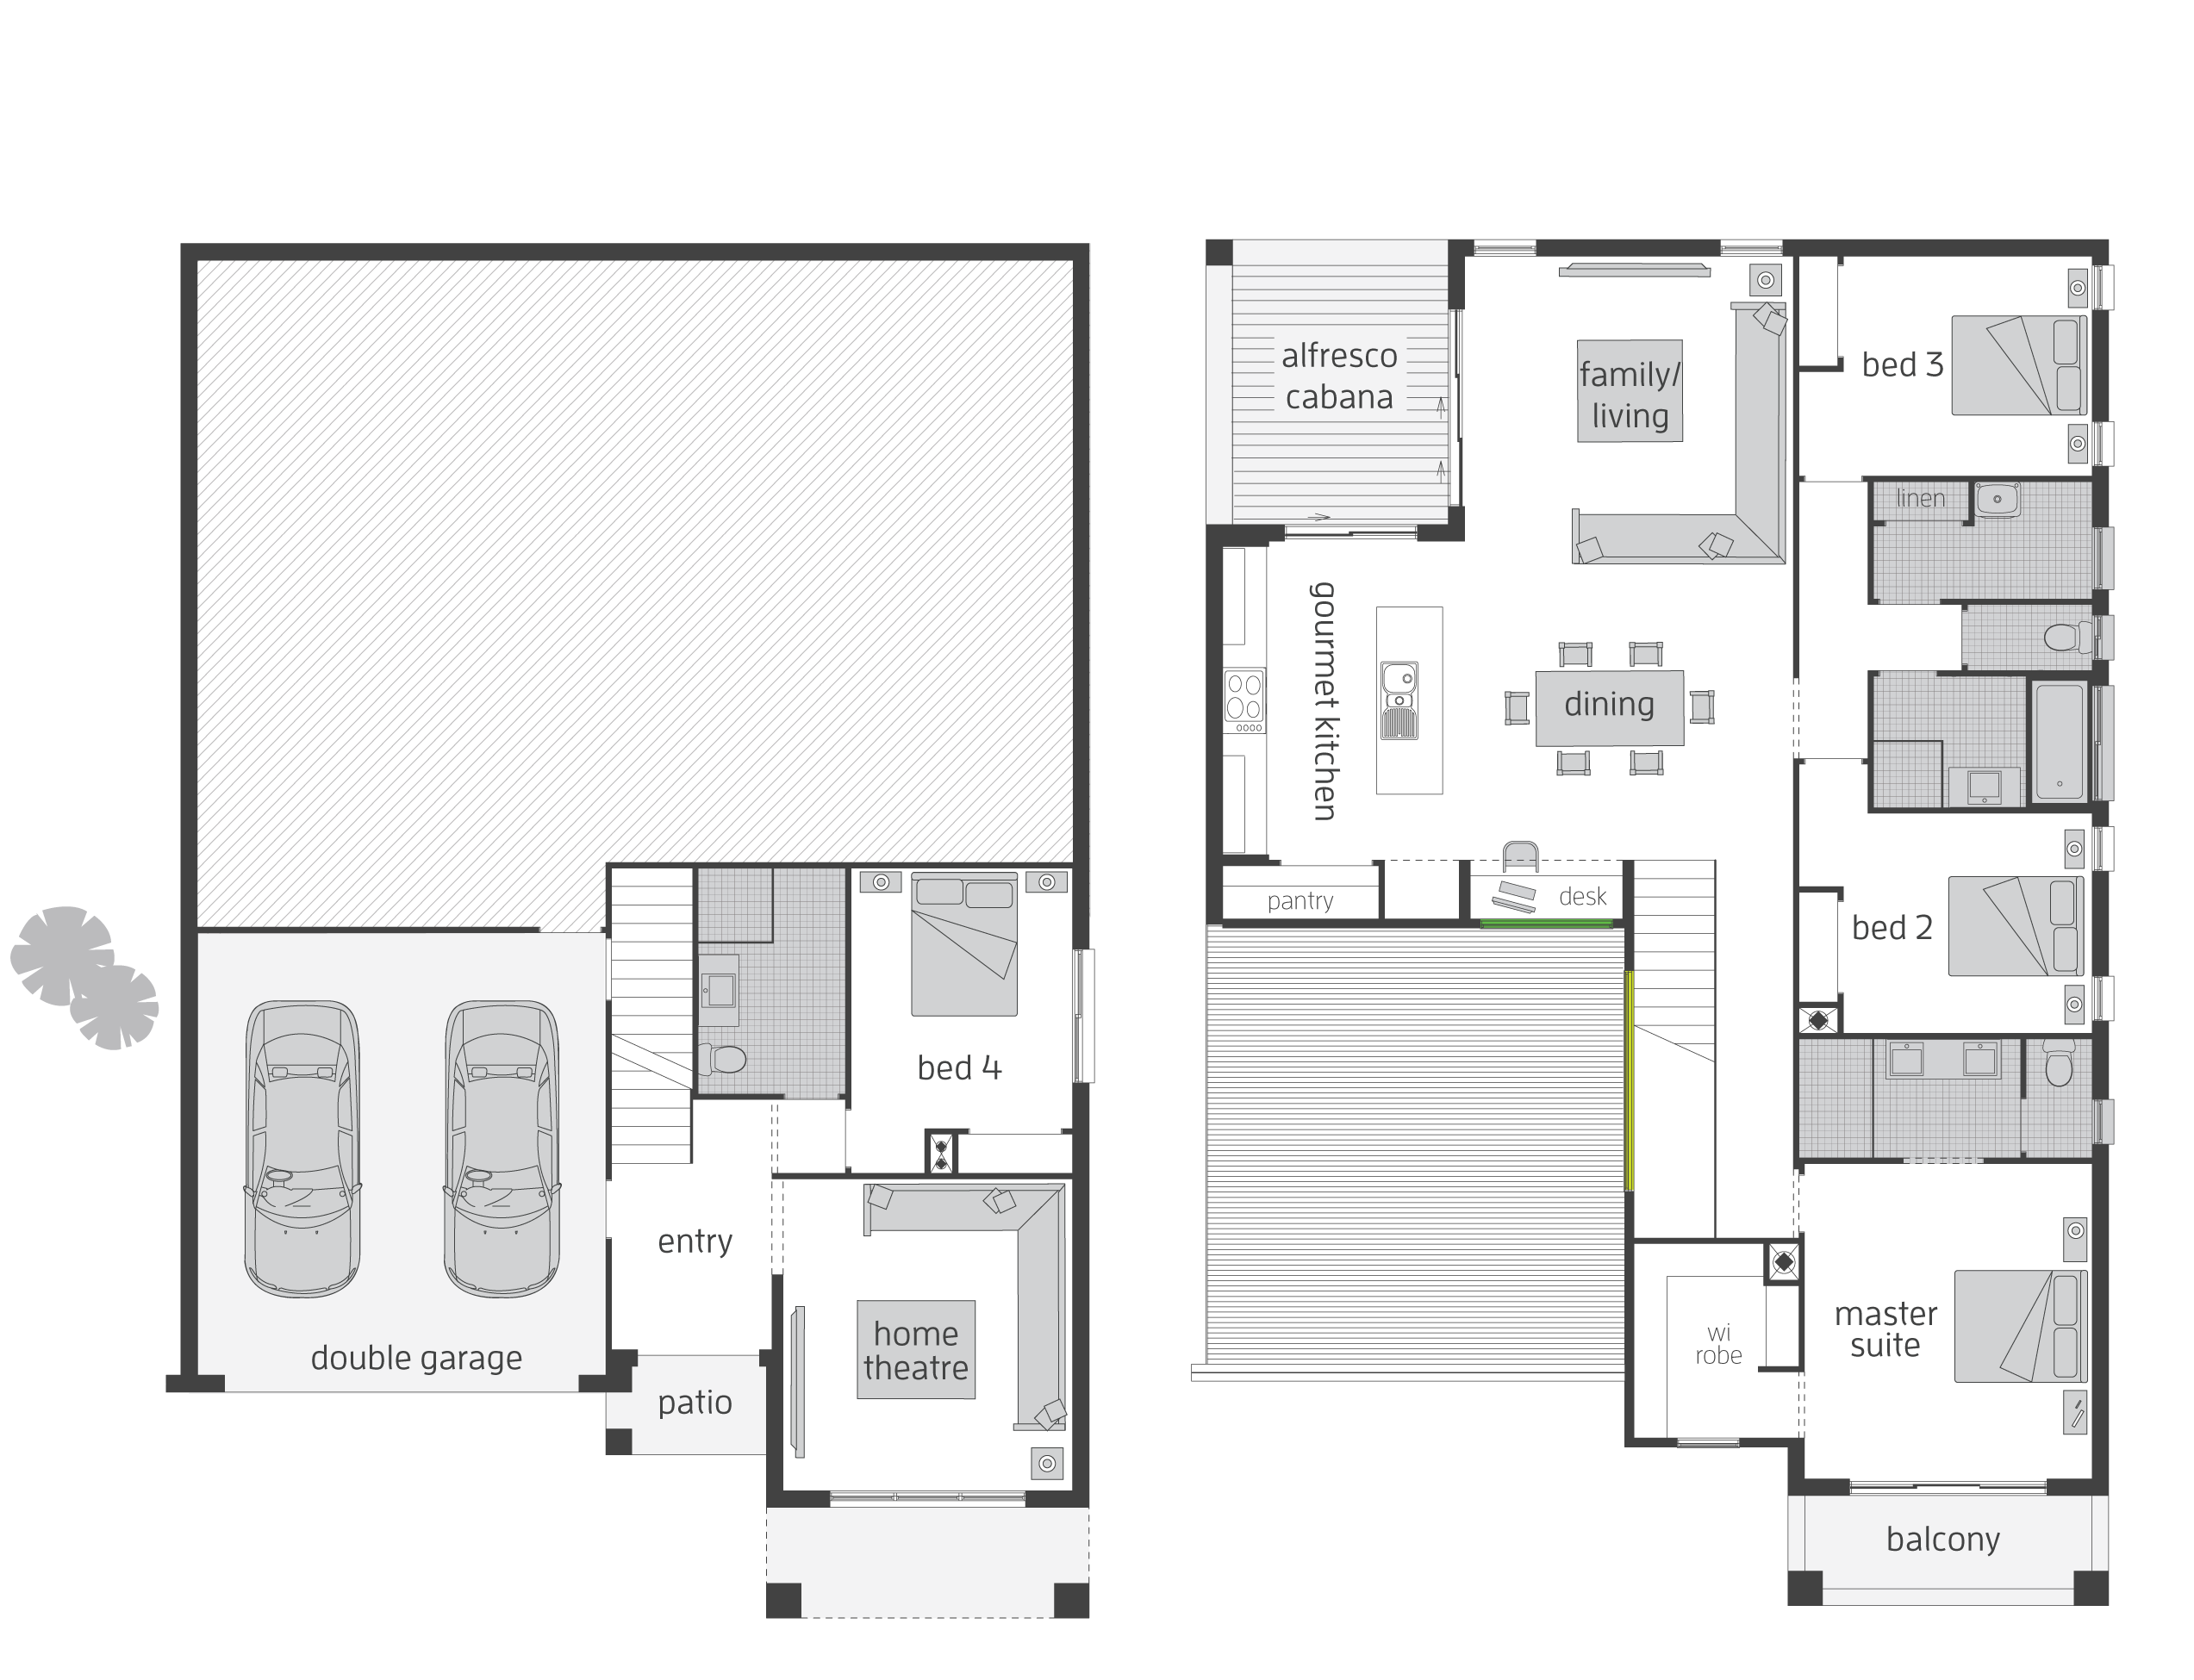 the bayview split level floor plan by mcdonald jones the bayview split level floor plan by mcdonald jones mcdonaldjones floorplan splitlevel